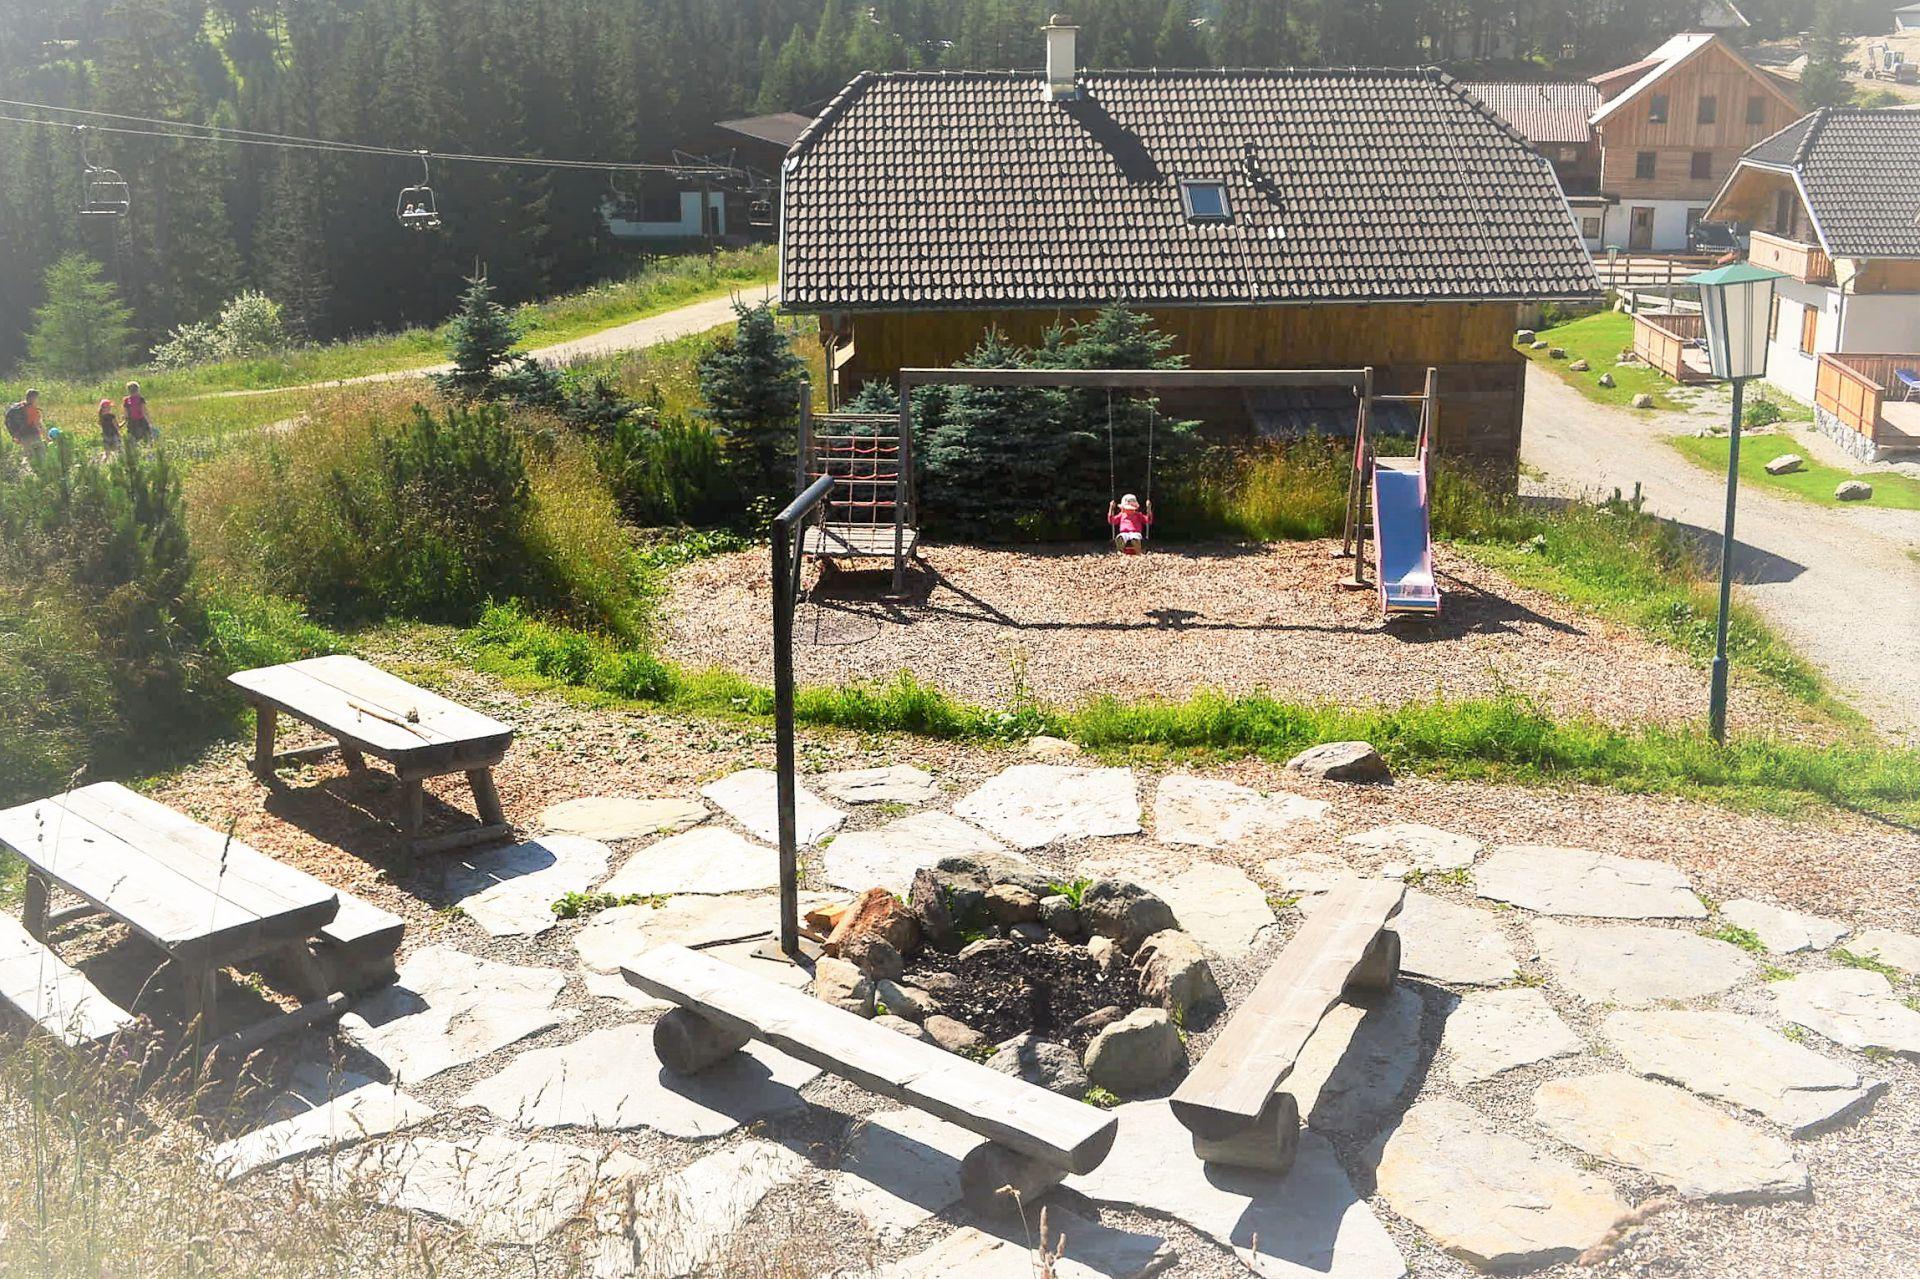 Unsere 3 Alm Chalets am Katschberg Bild 1